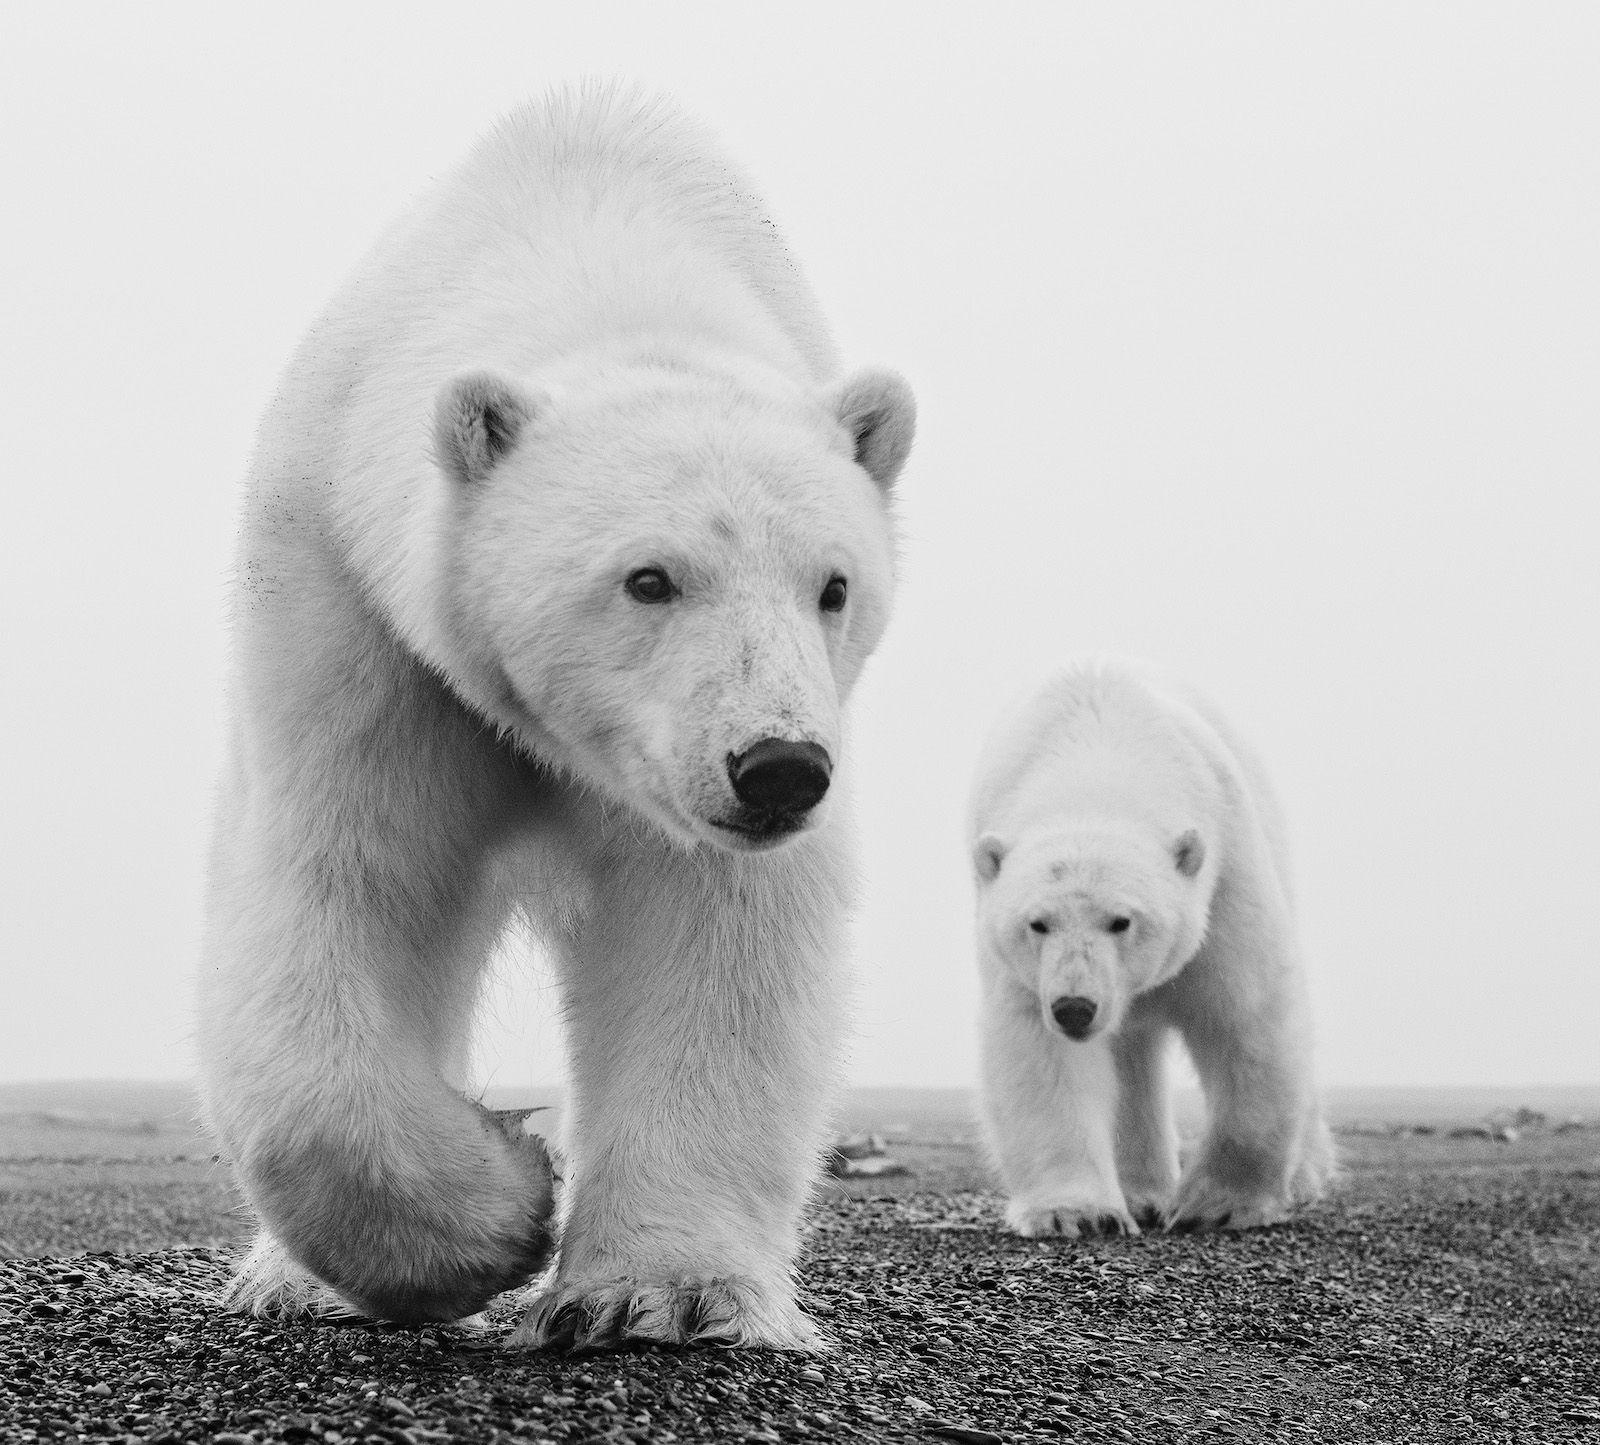 David Yarrow |Wildlife | David Yarrow Photography's Wildlife Section